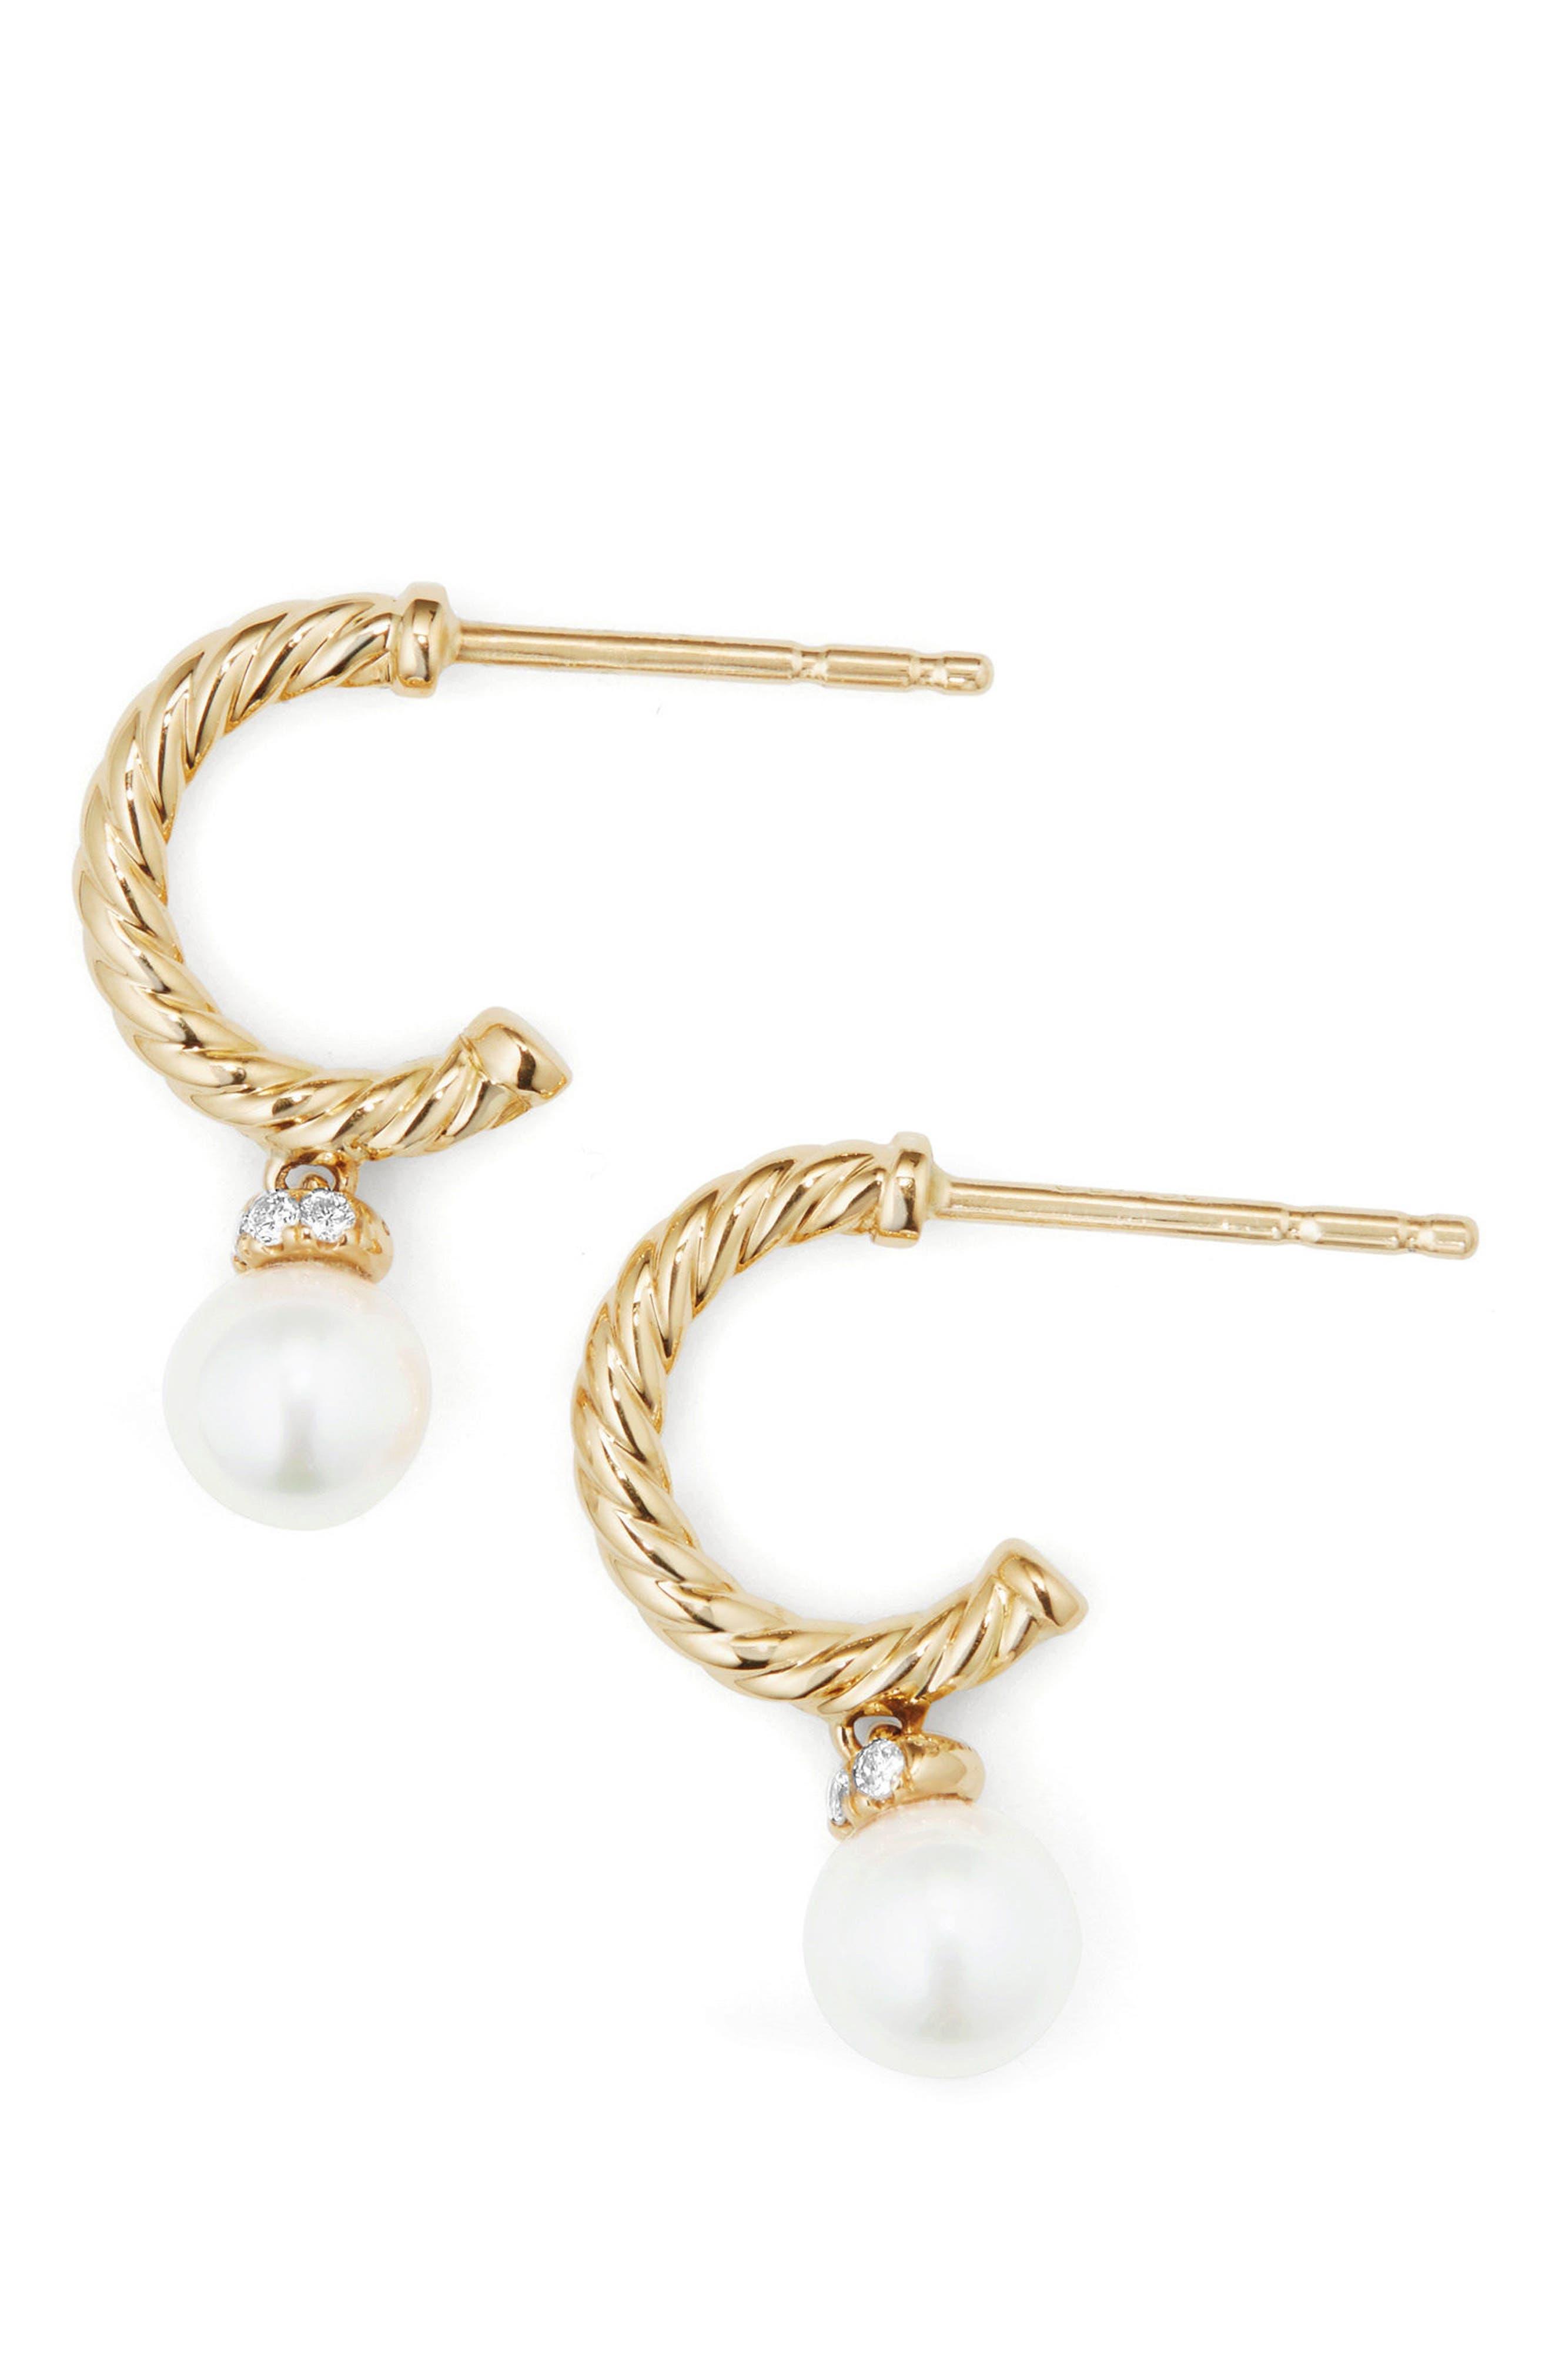 Solari Hoop Earrings with Diamonds & Pearls in 18K Gold,                         Main,                         color, YELLOW GOLD/ DIAMOND/ PEARL